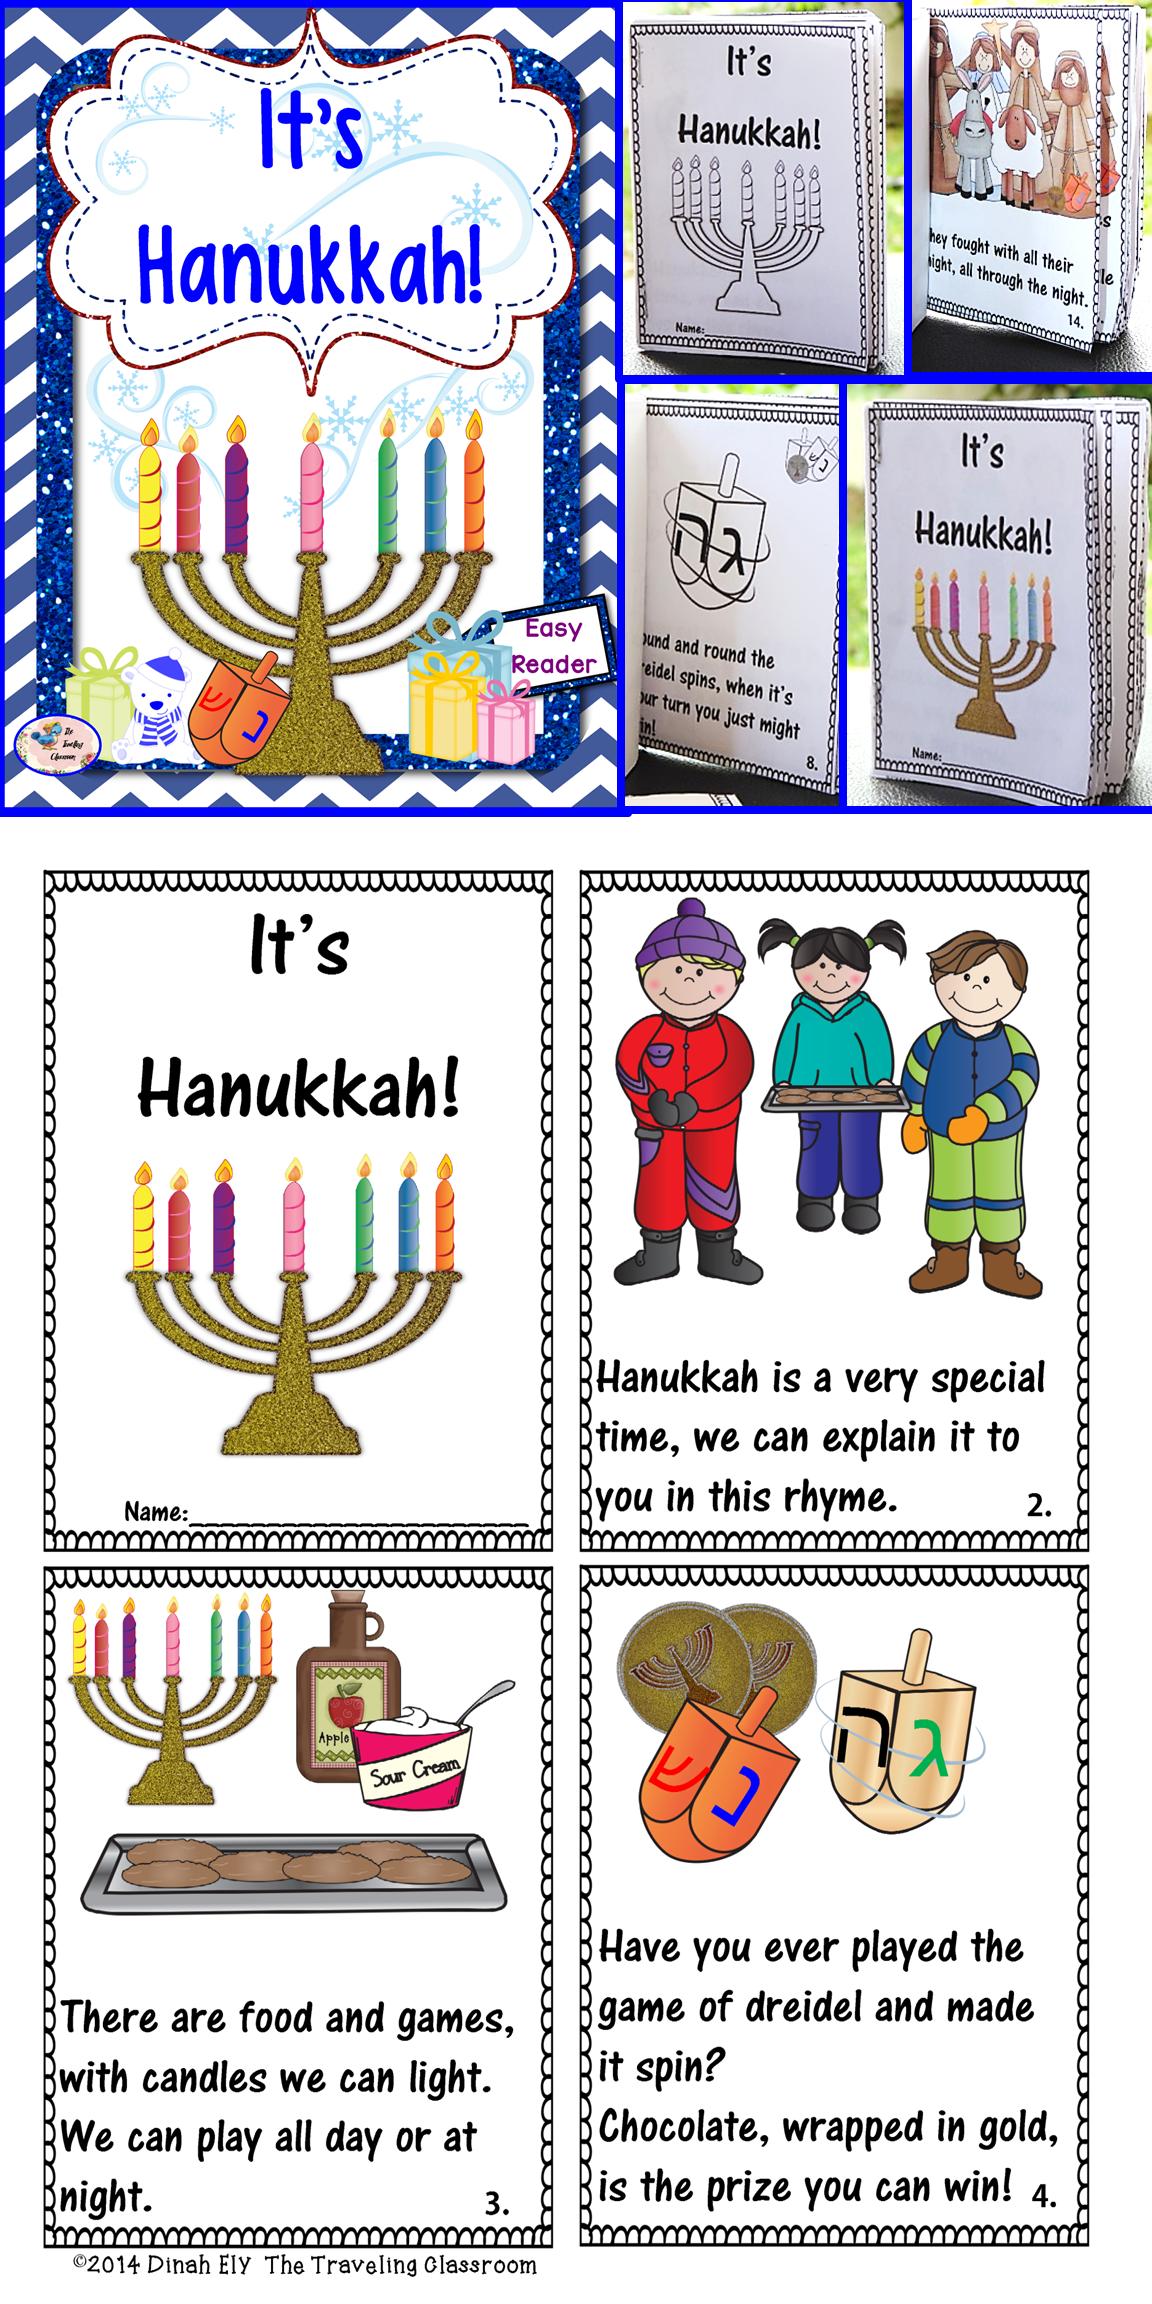 Hanukkah Activities Chanukah Hanukkah Activites Hanukkah Lessons Hanukkah [ 2304 x 1152 Pixel ]